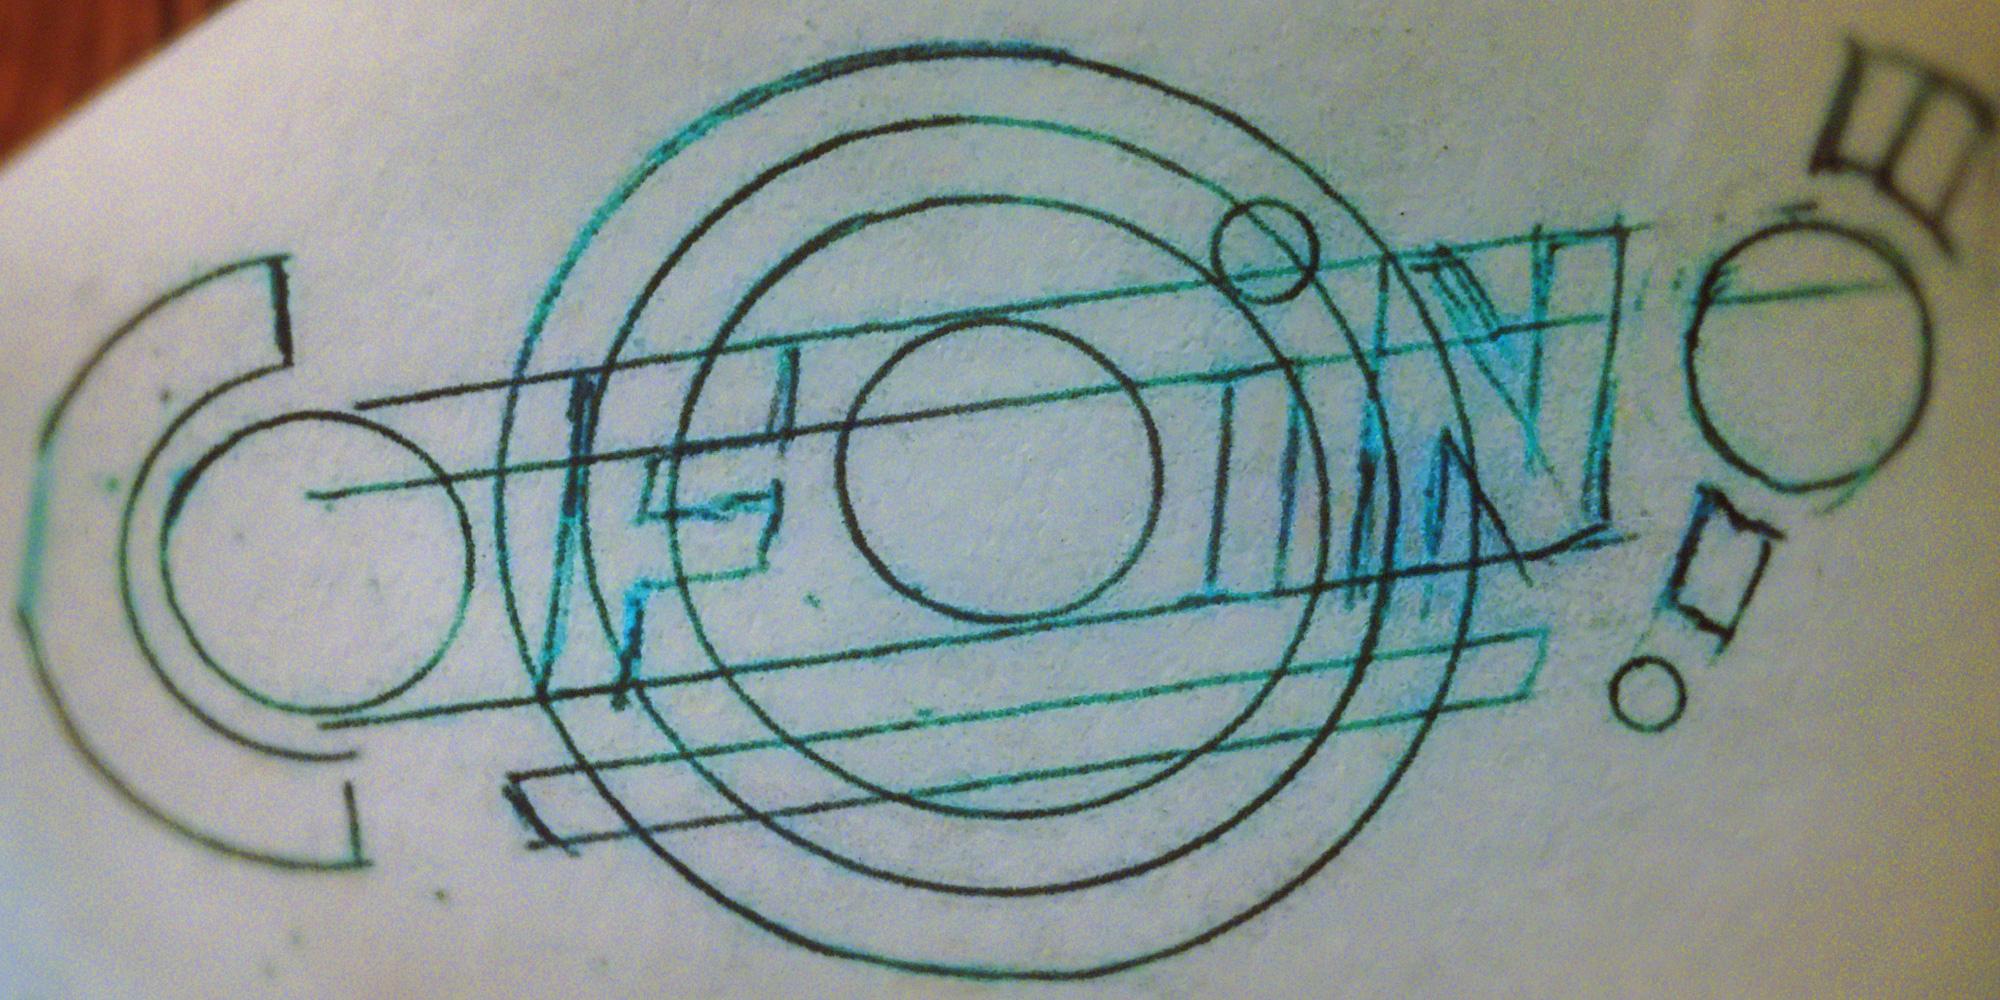 http://www.friendsinyourhead.com/arduino/040.jpg